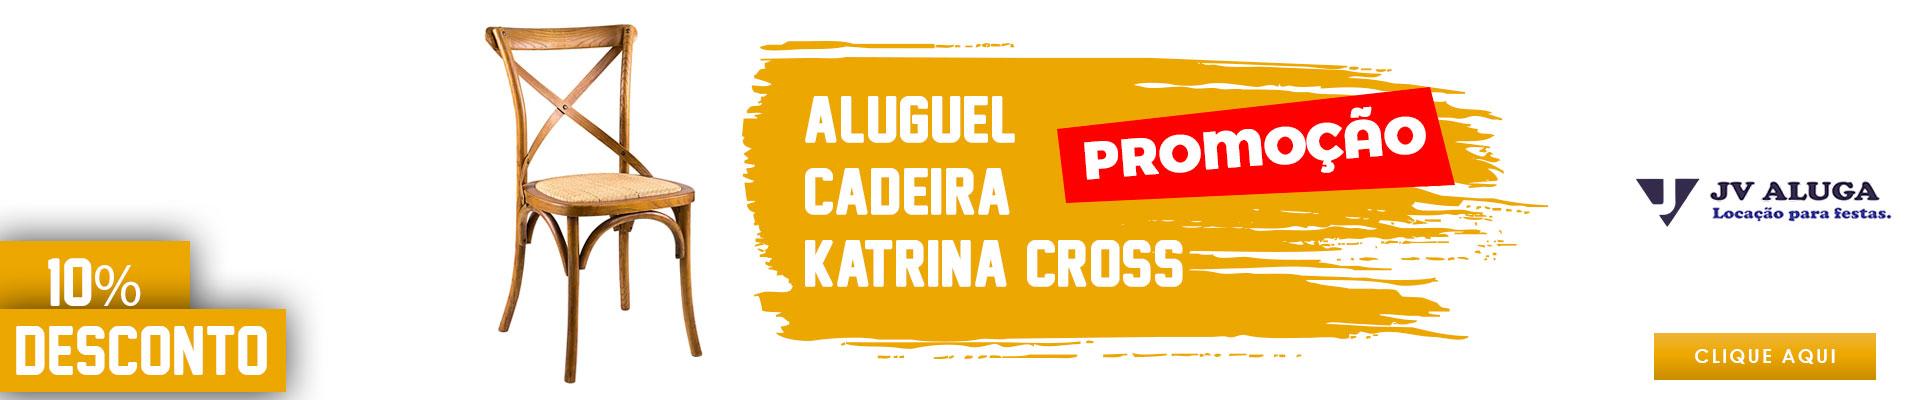 Aluguel Cadeira Katrina Cross